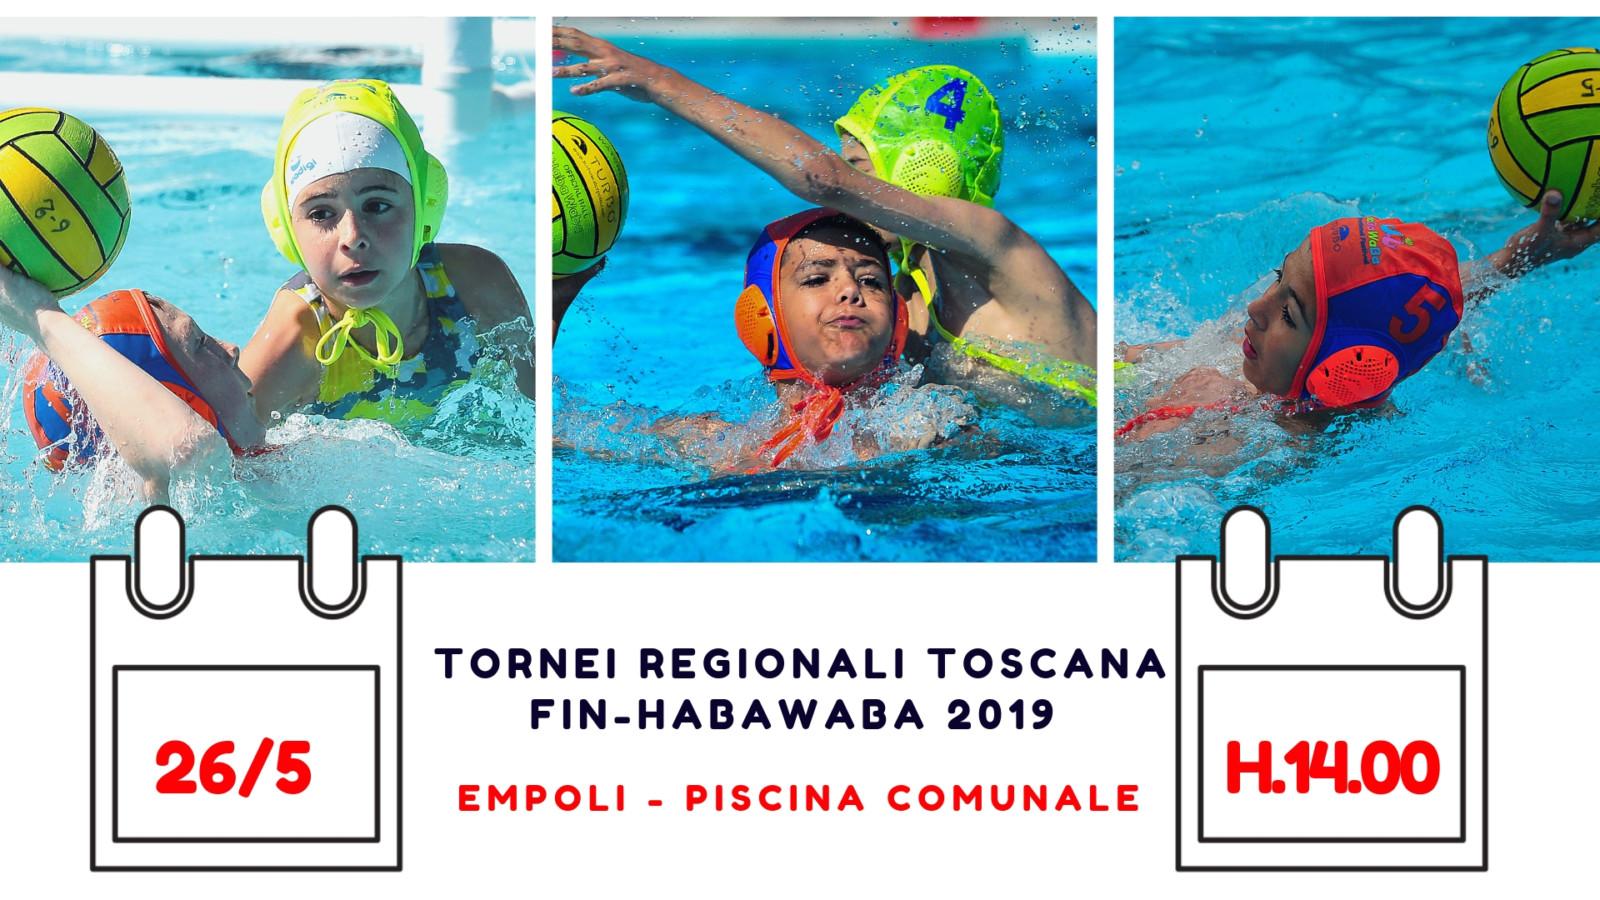 Copy of tornei regionali TOSCANA fin-habawaba 2019 day 3